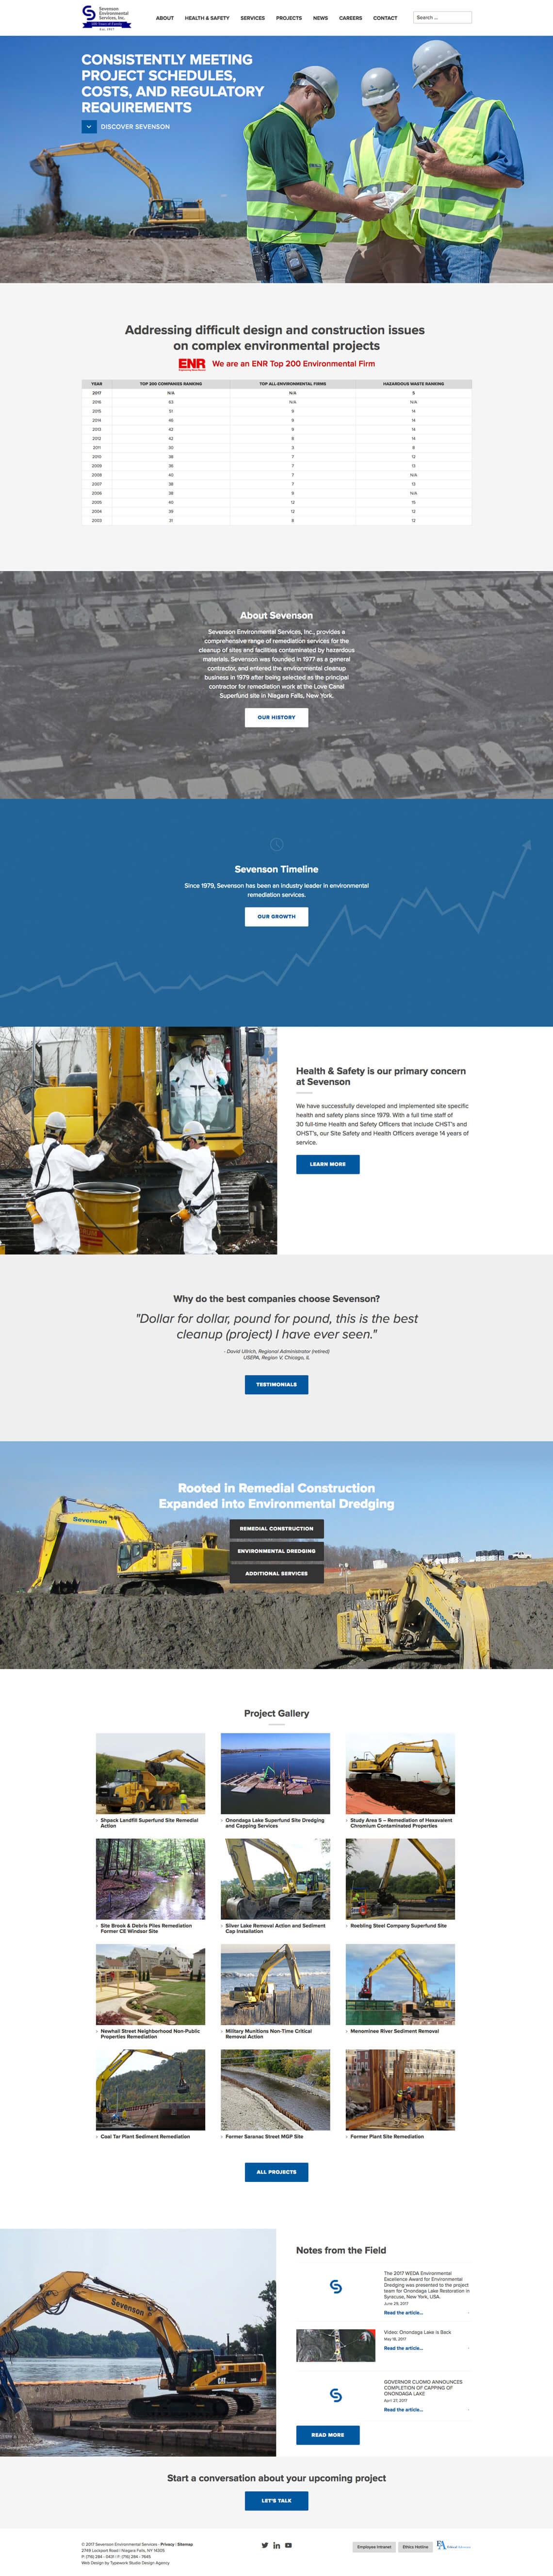 Sevenson CMS Web Design